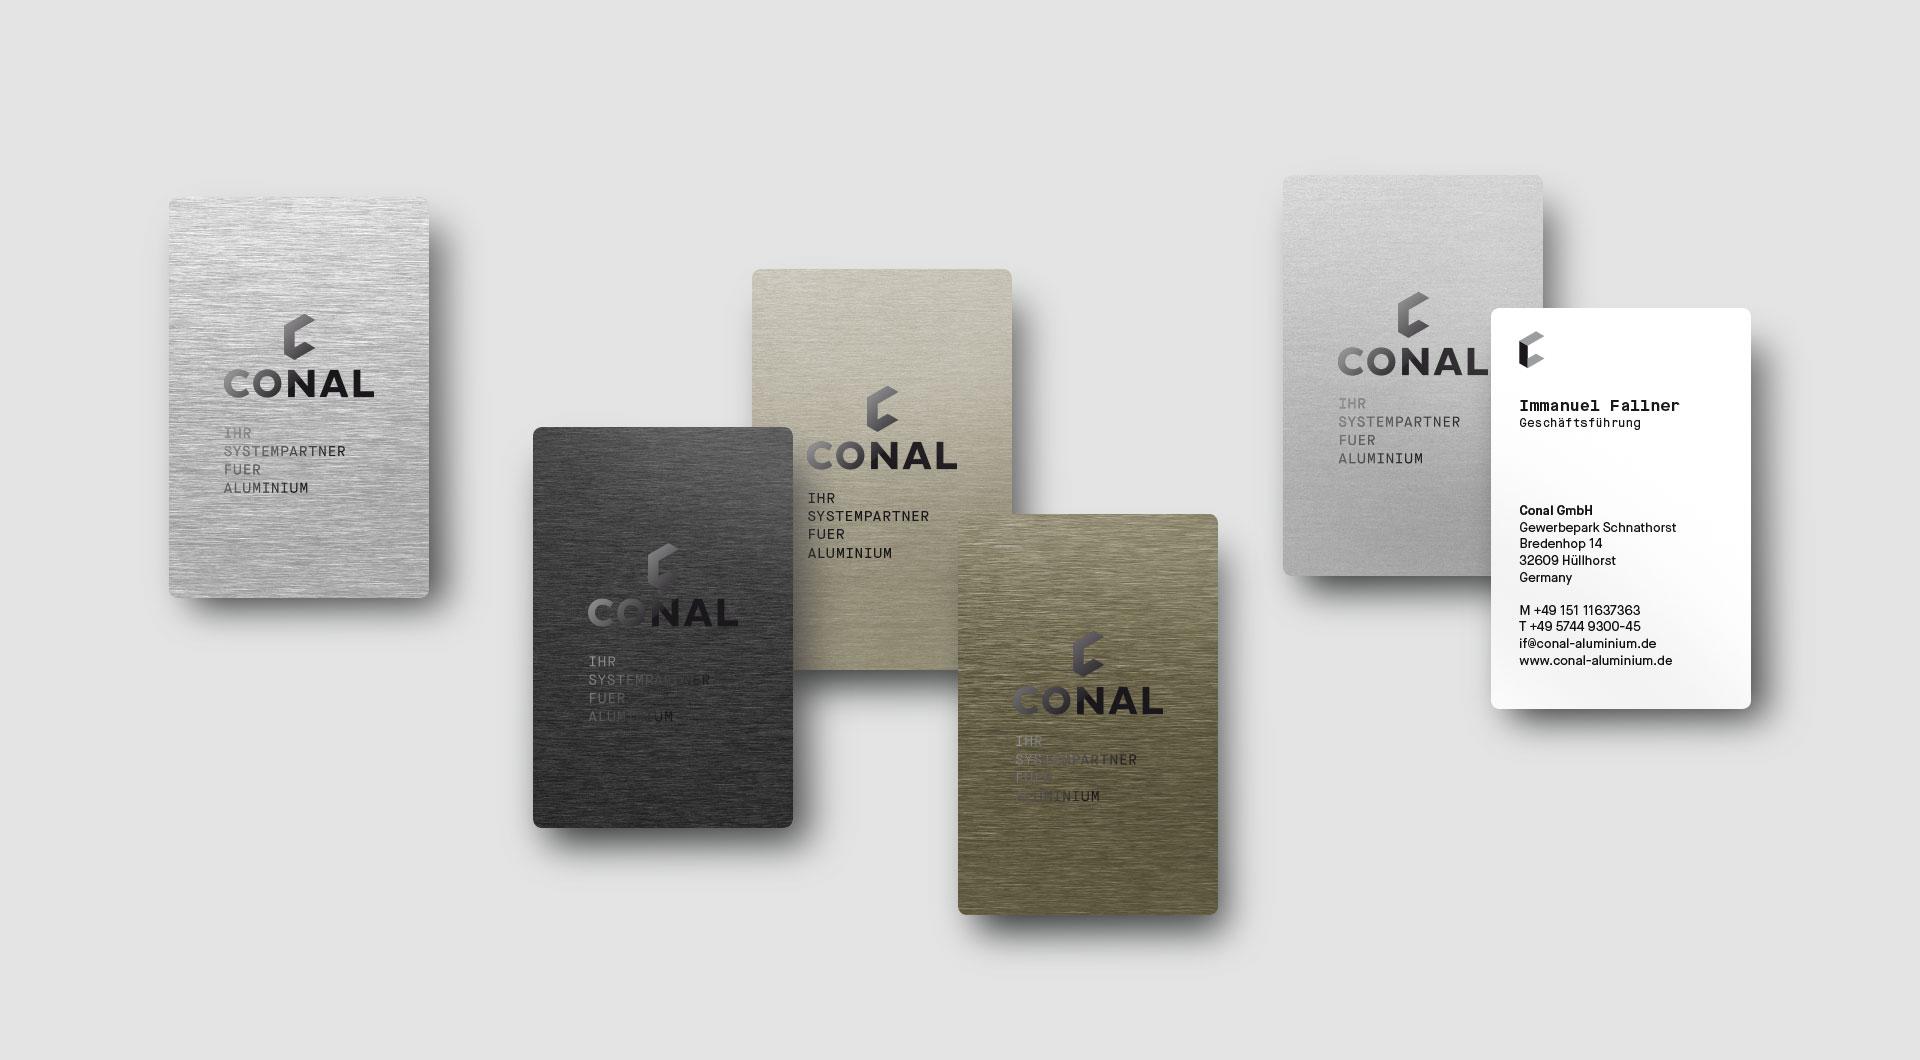 conal corporate design 01